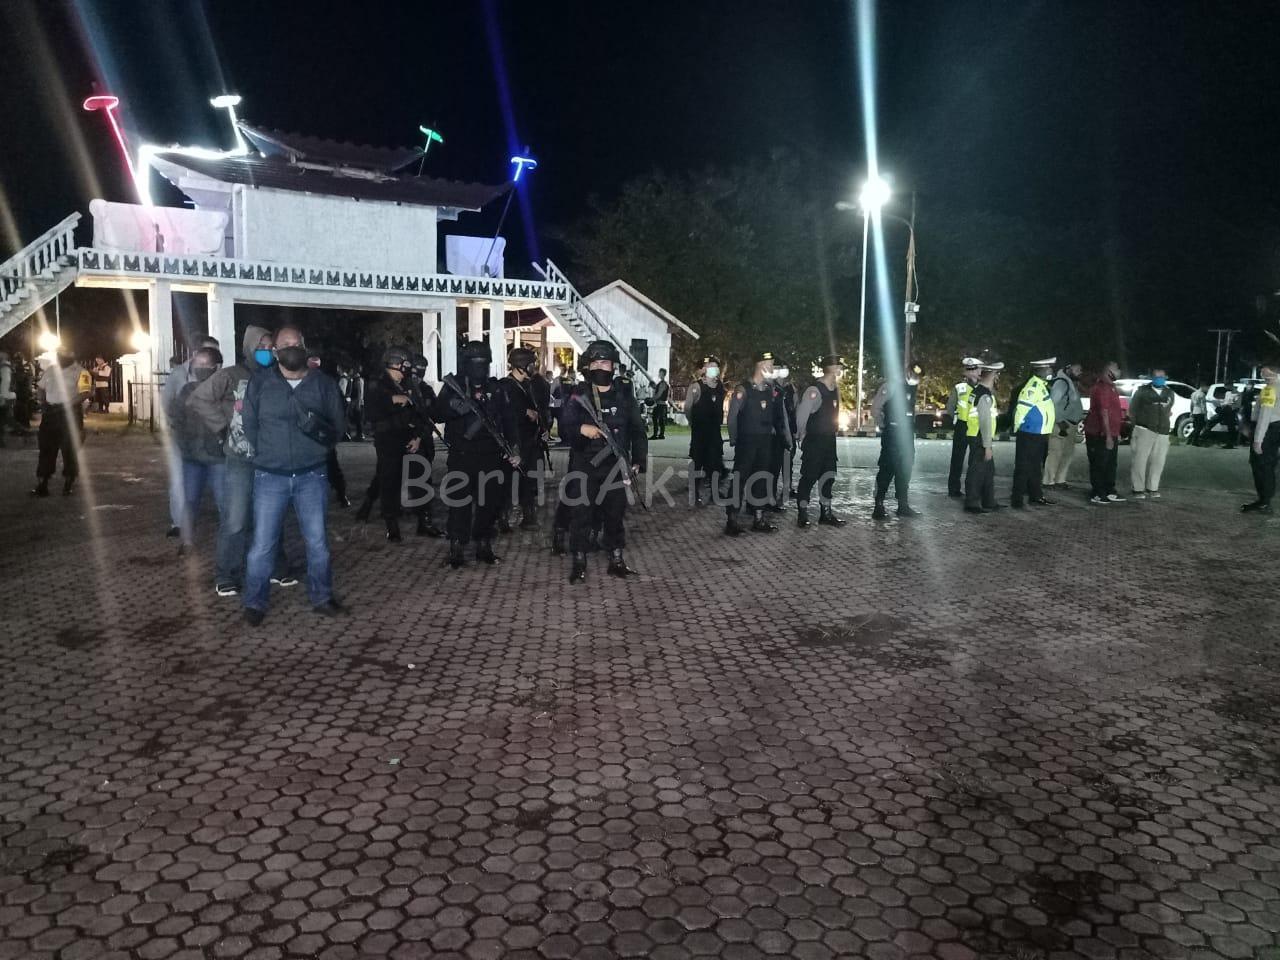 Polda PB Siapkan 317 Personil Buru Pelaku Kejahatan di Manokwari 4 IMG 20200426 WA0060